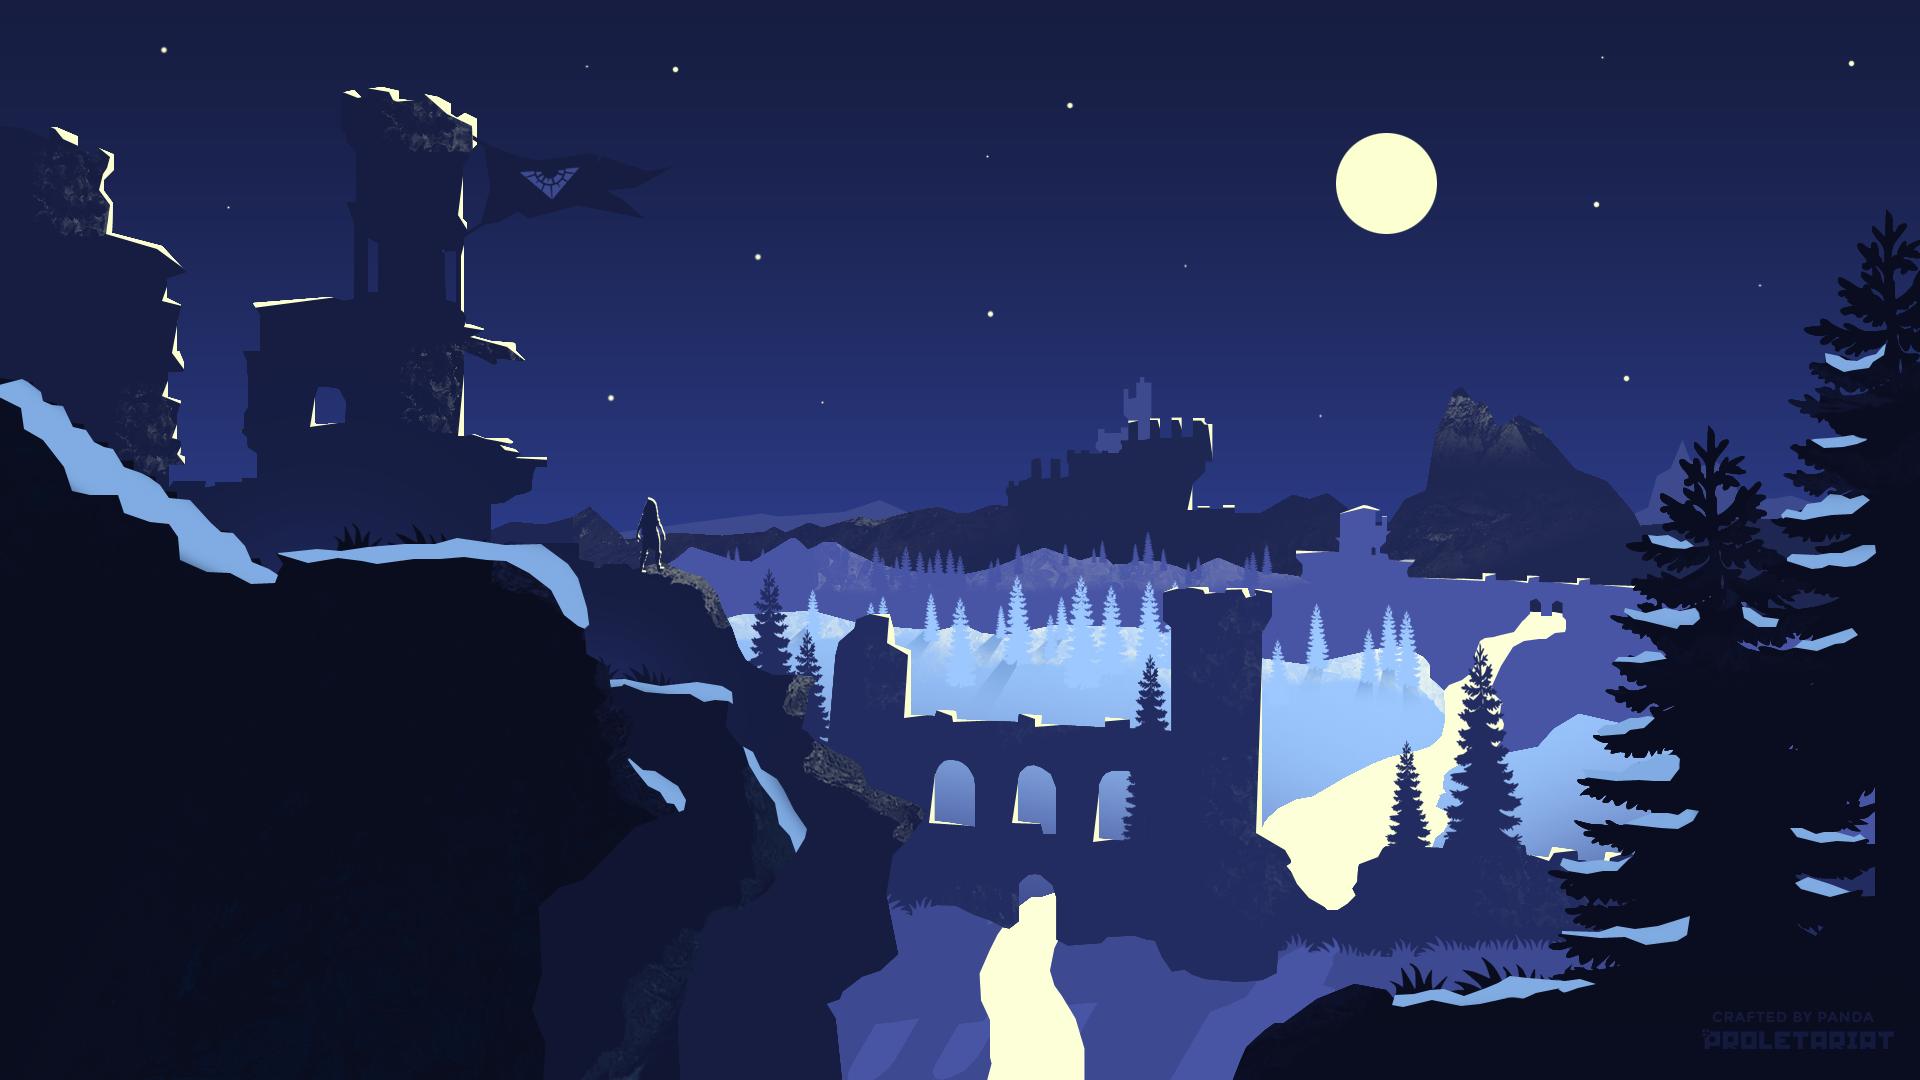 Wallpaper-4-Winter.png